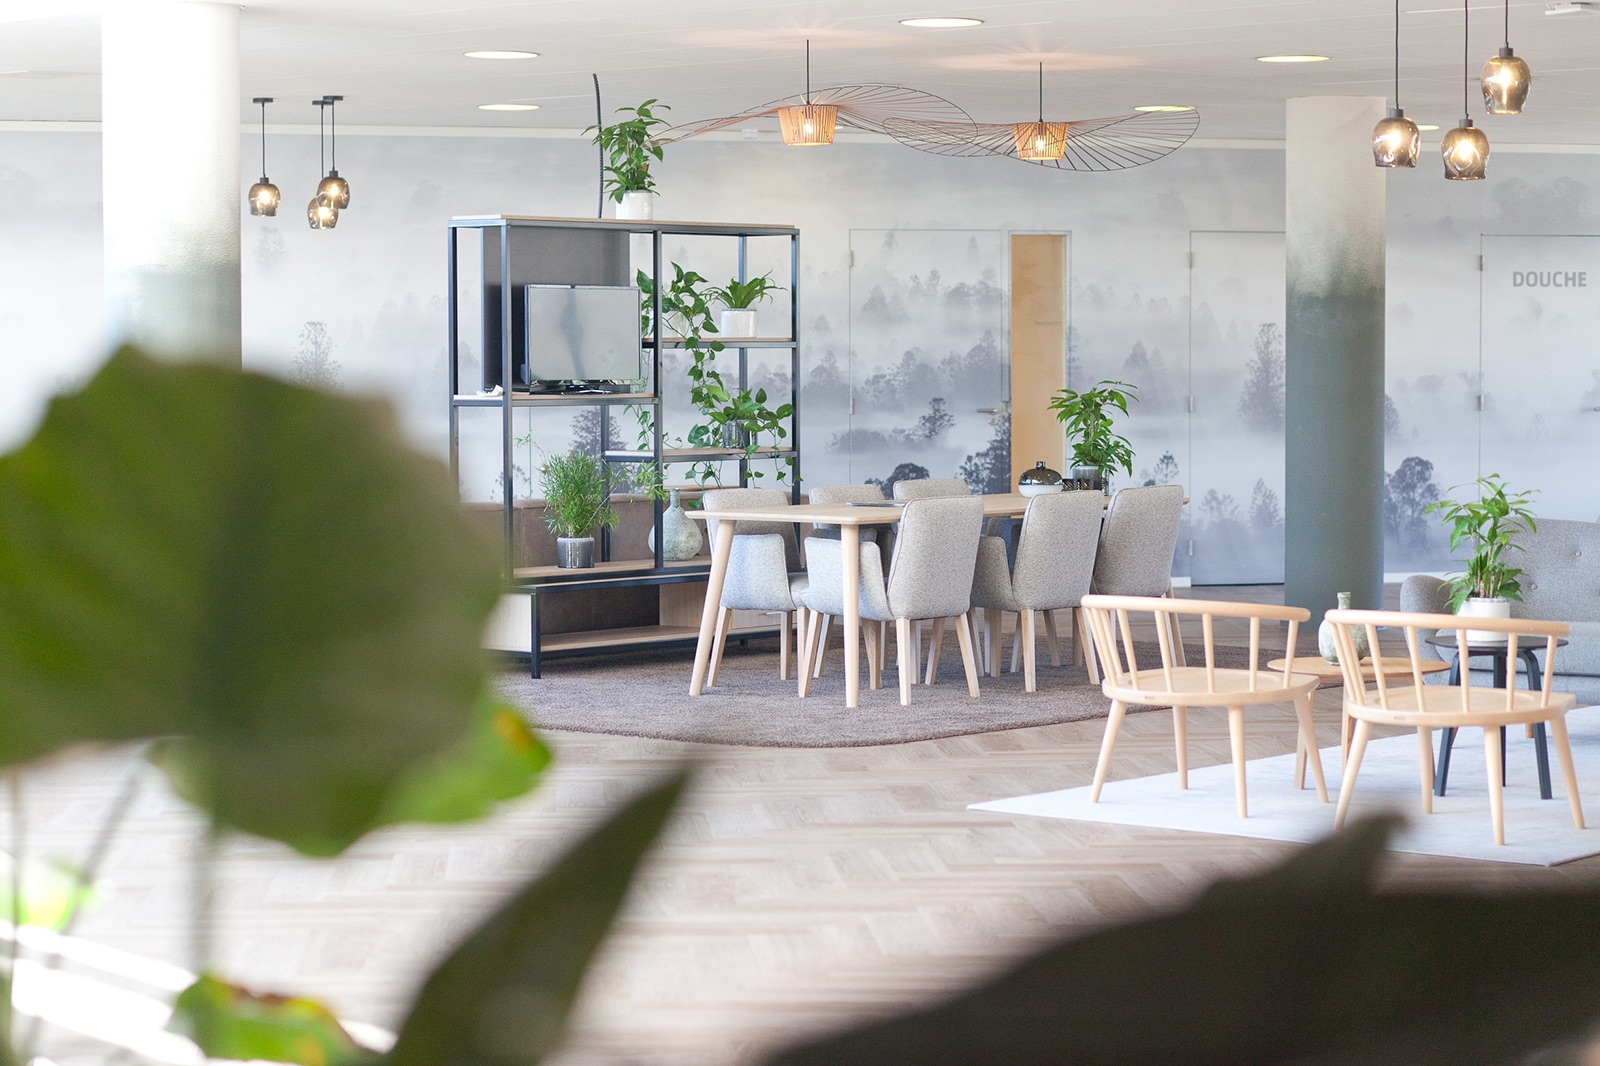 merin-office-netherlands-5